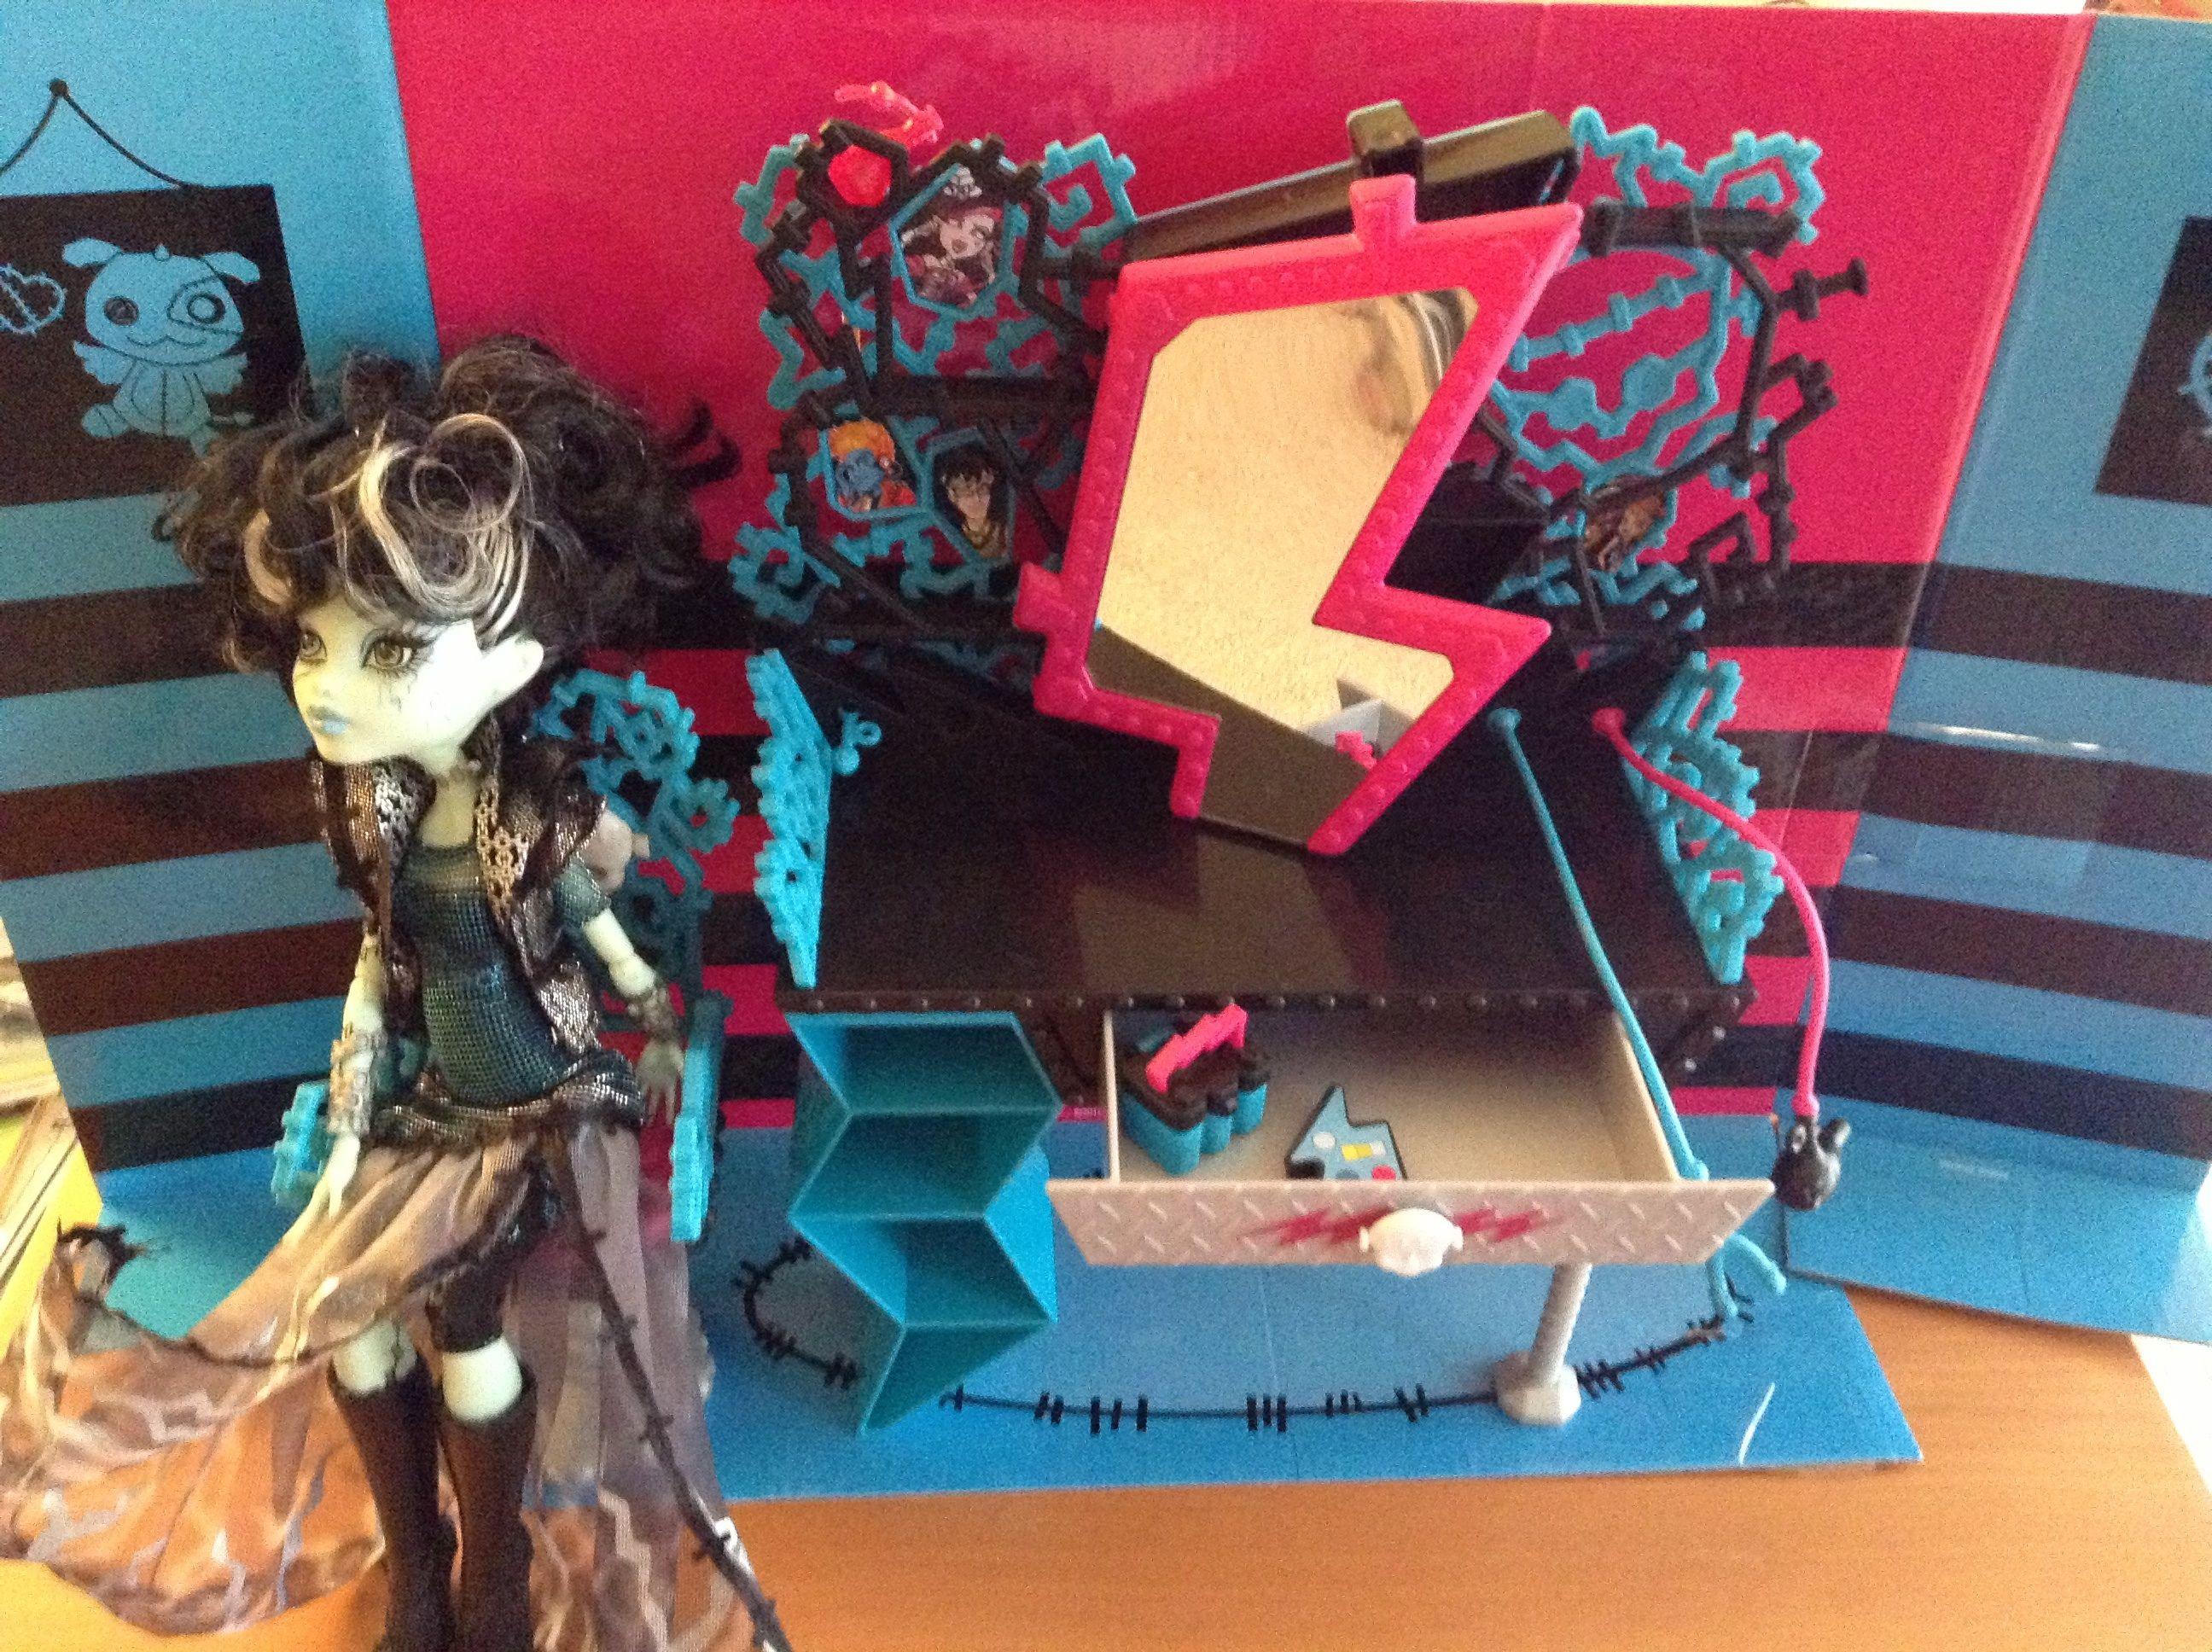 Monster High Makeup Table